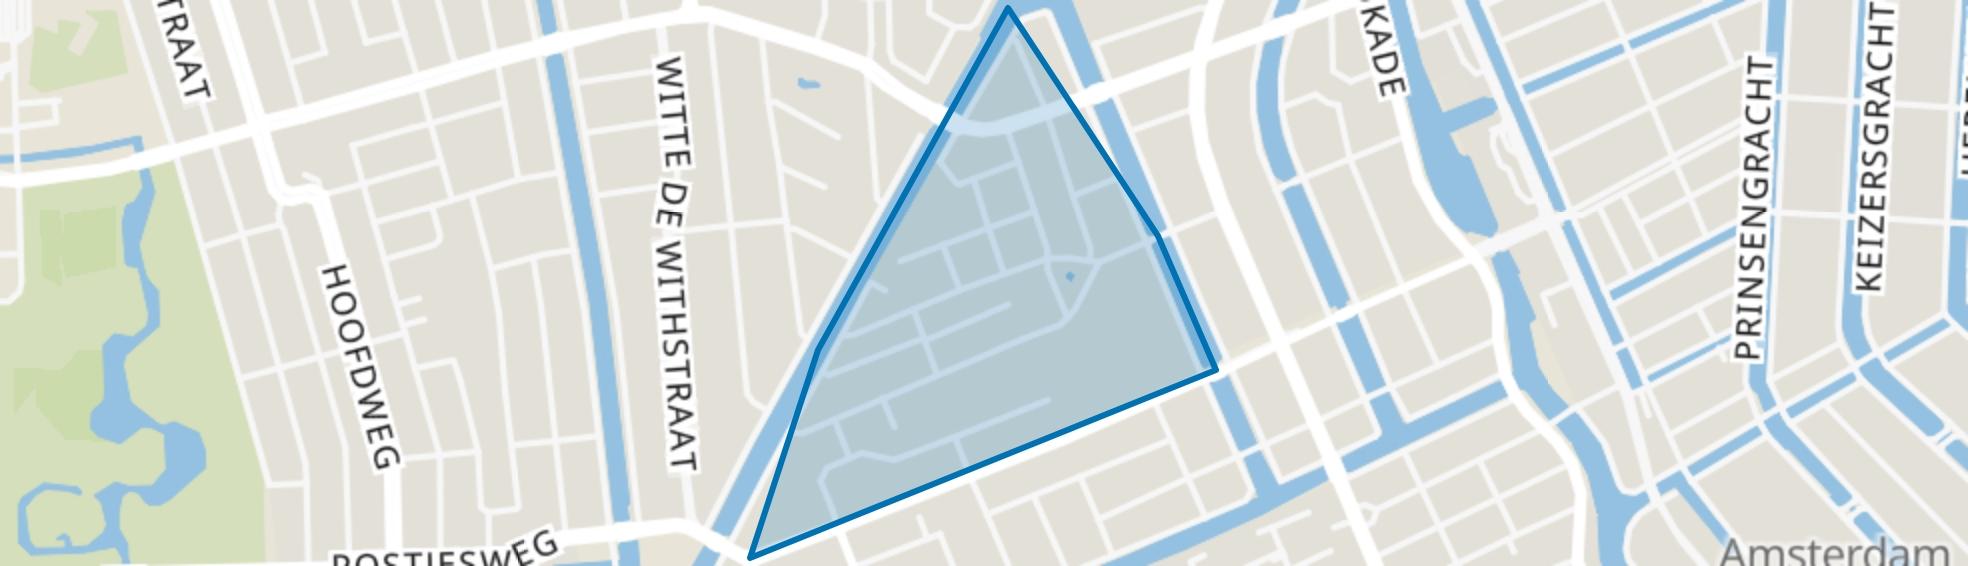 Kinkerbuurt, Amsterdam map